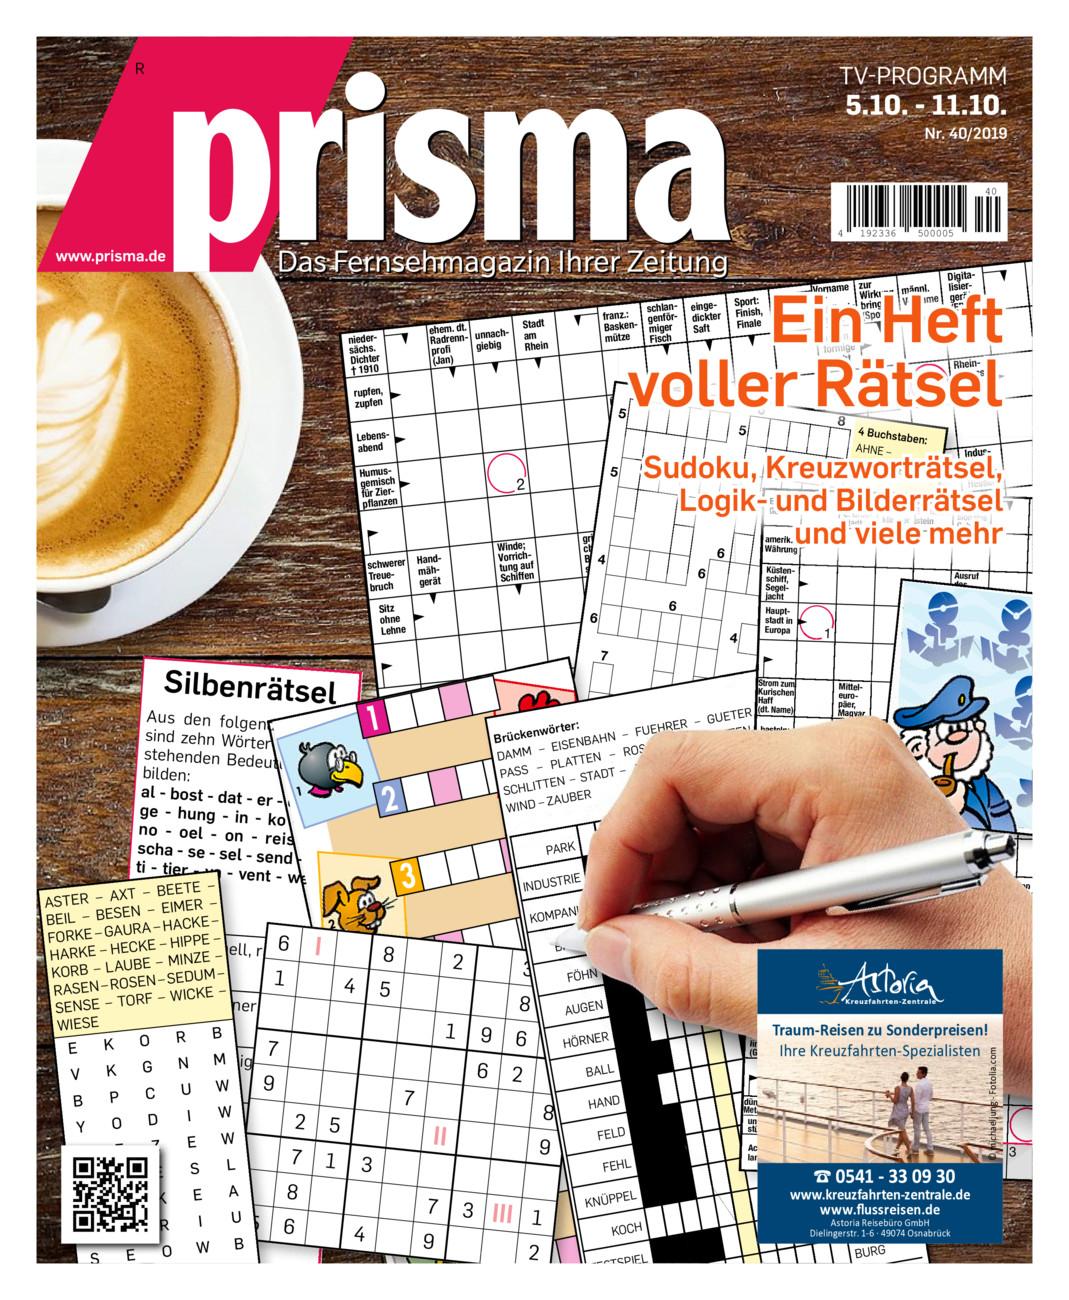 Prisma 05.10. - 11.10.